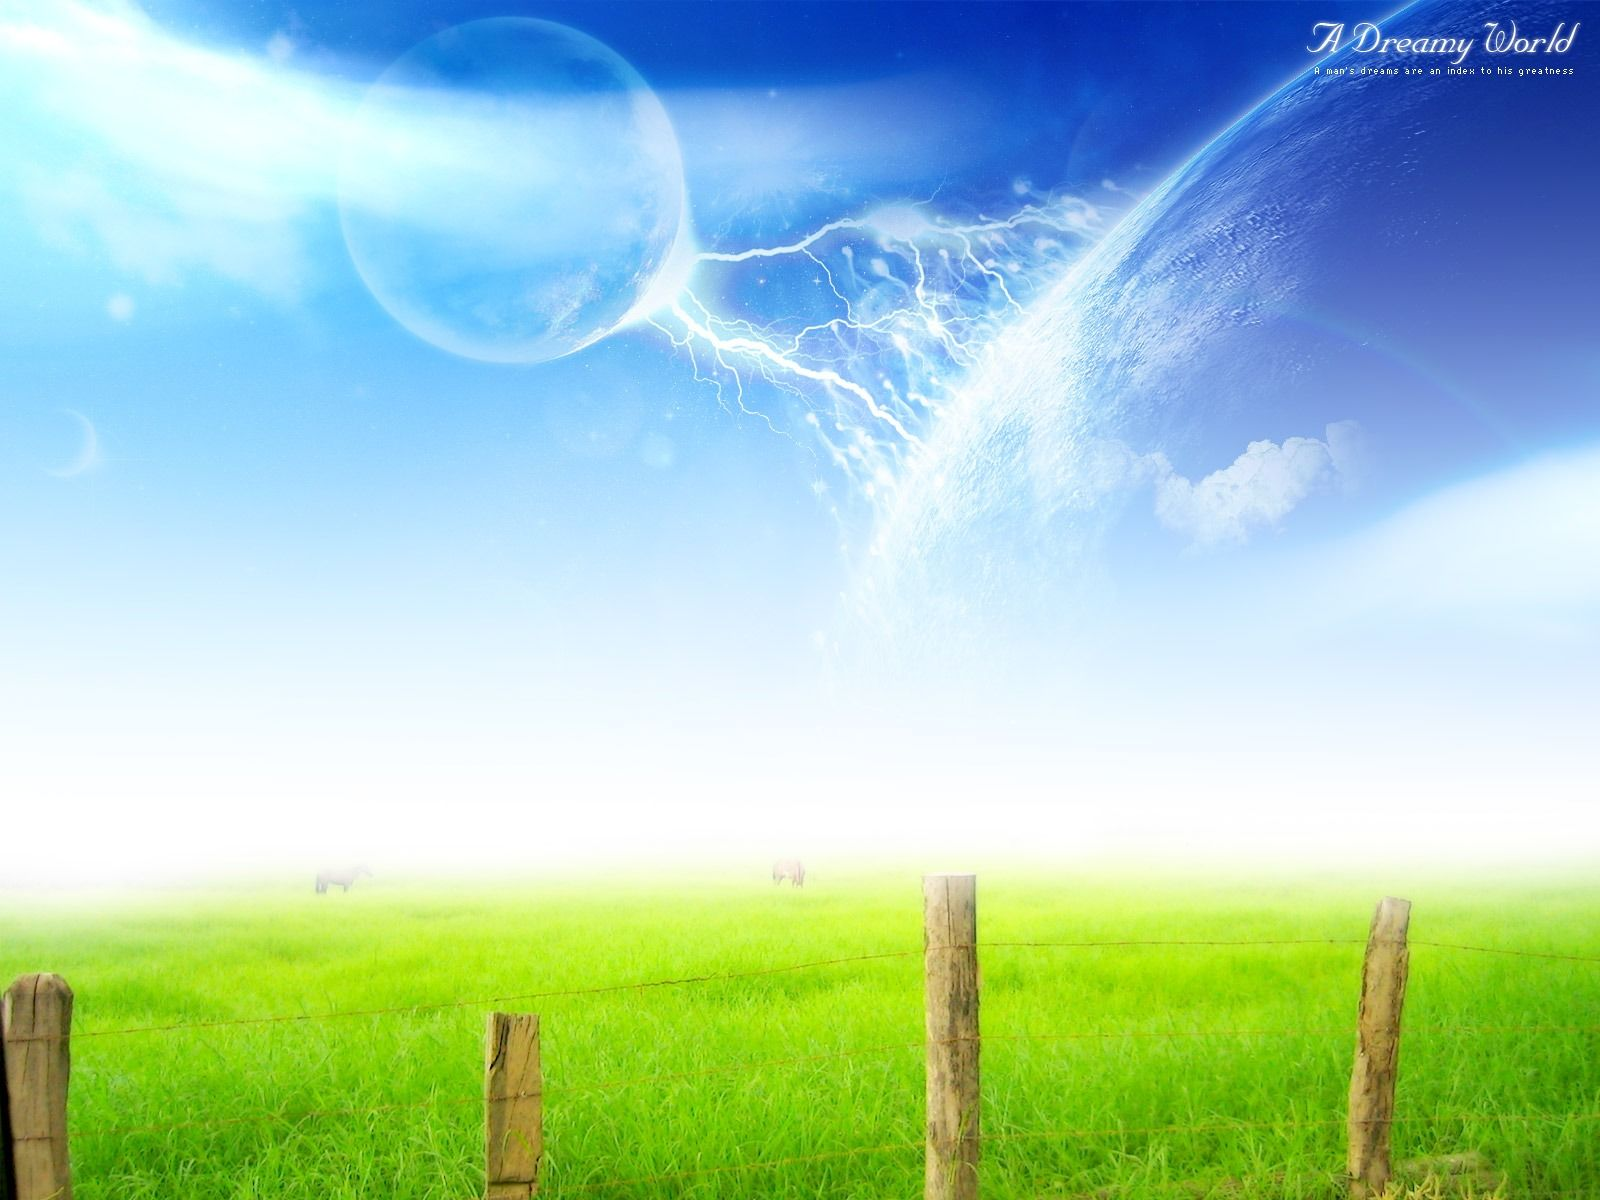 A Dreamy World Beautiful HD Wallpapers All 1600x1200